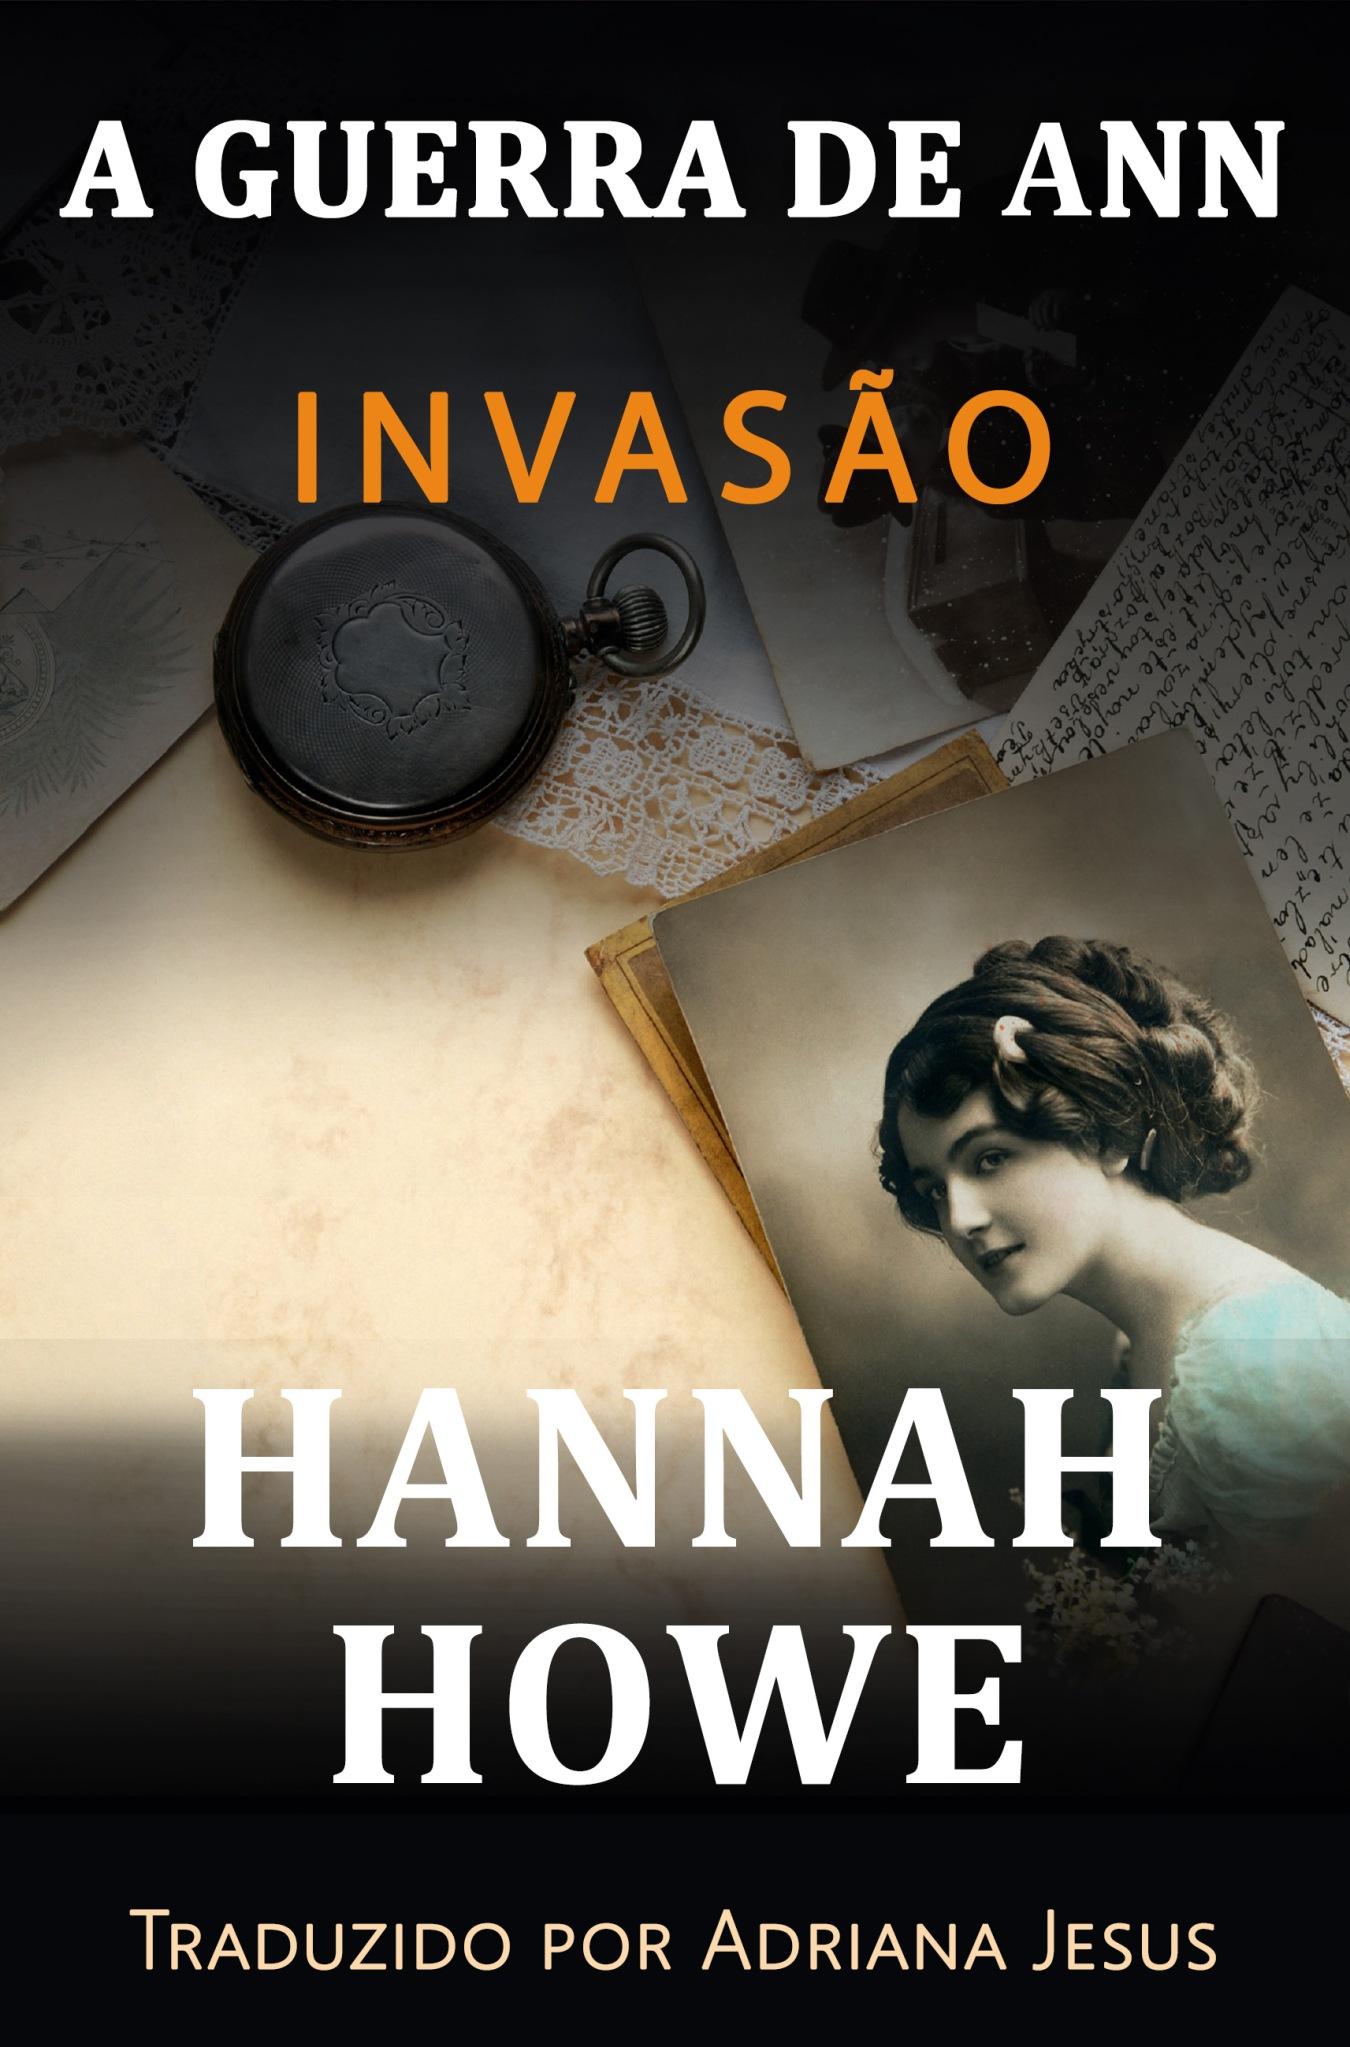 ANN'S WAR INVASION PORTUGUESE